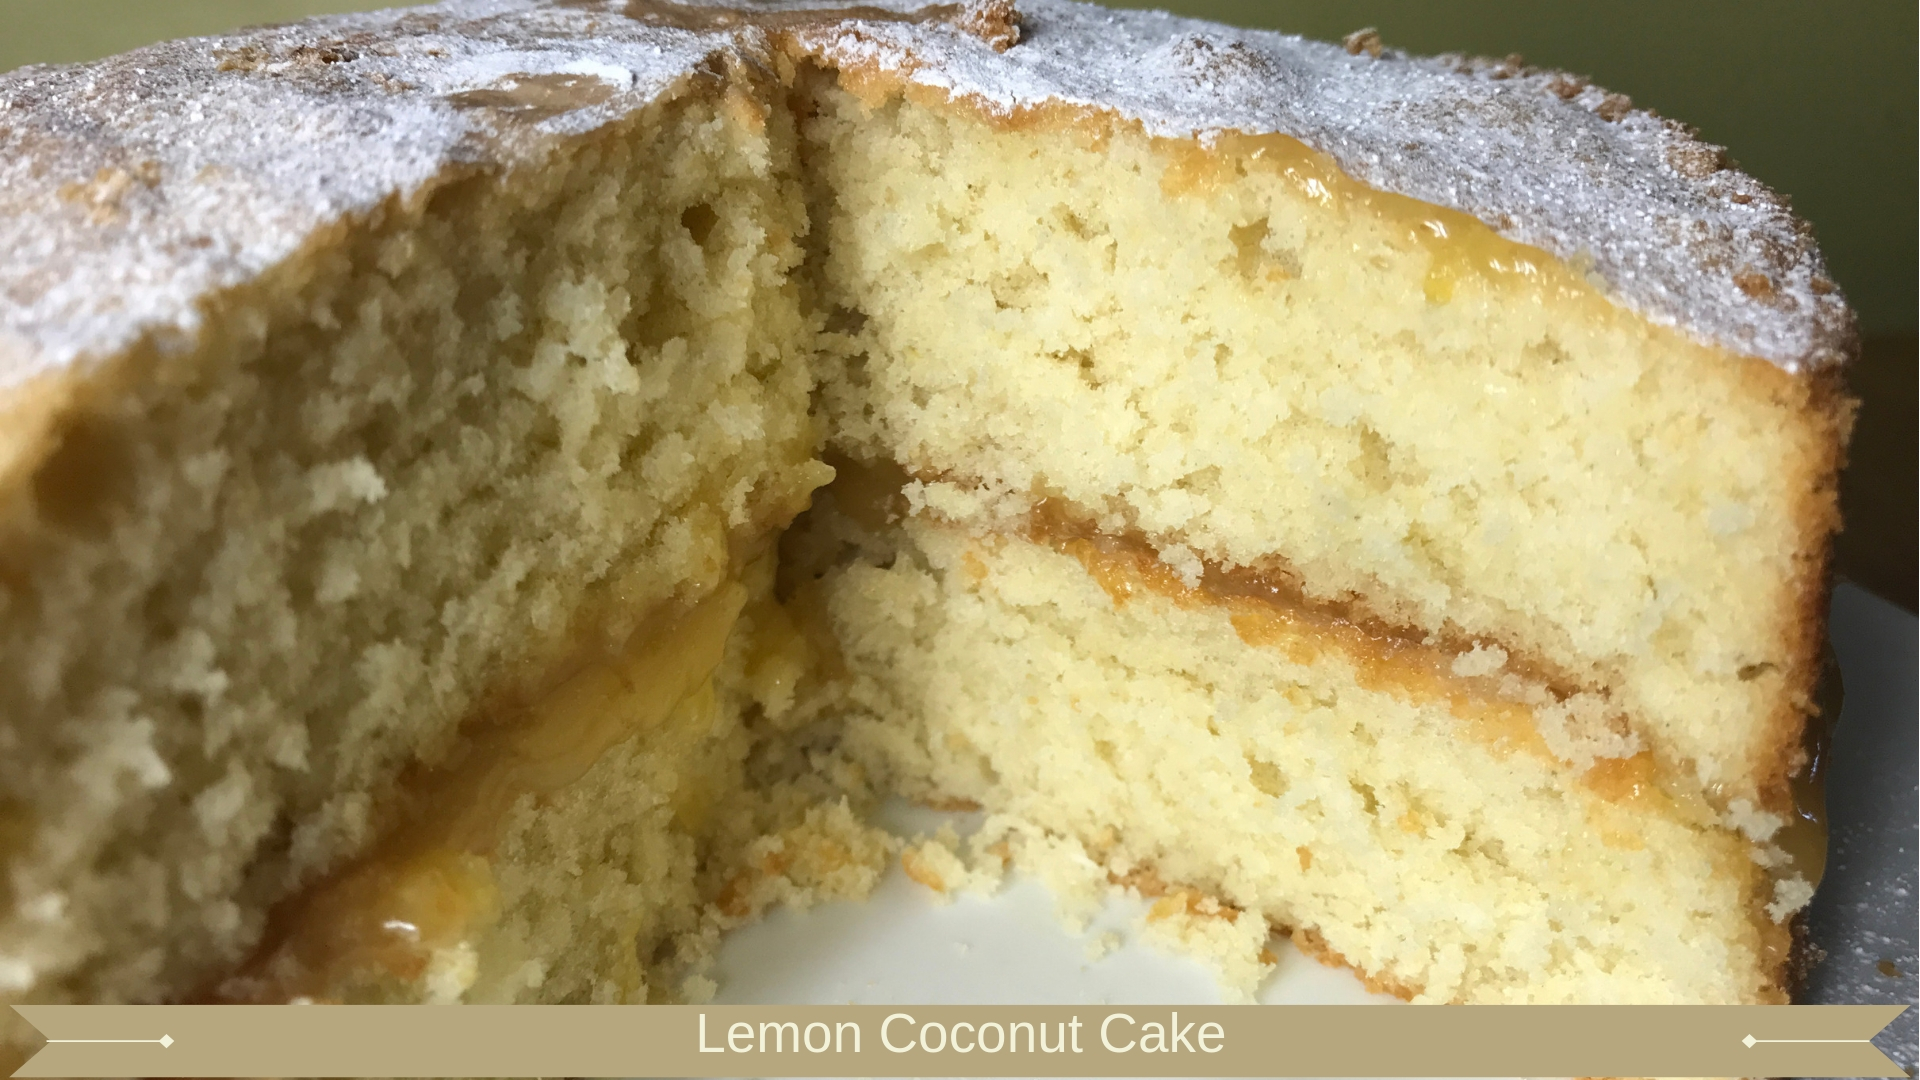 Lemon Coconut Cake - Meadow Brown Bakery